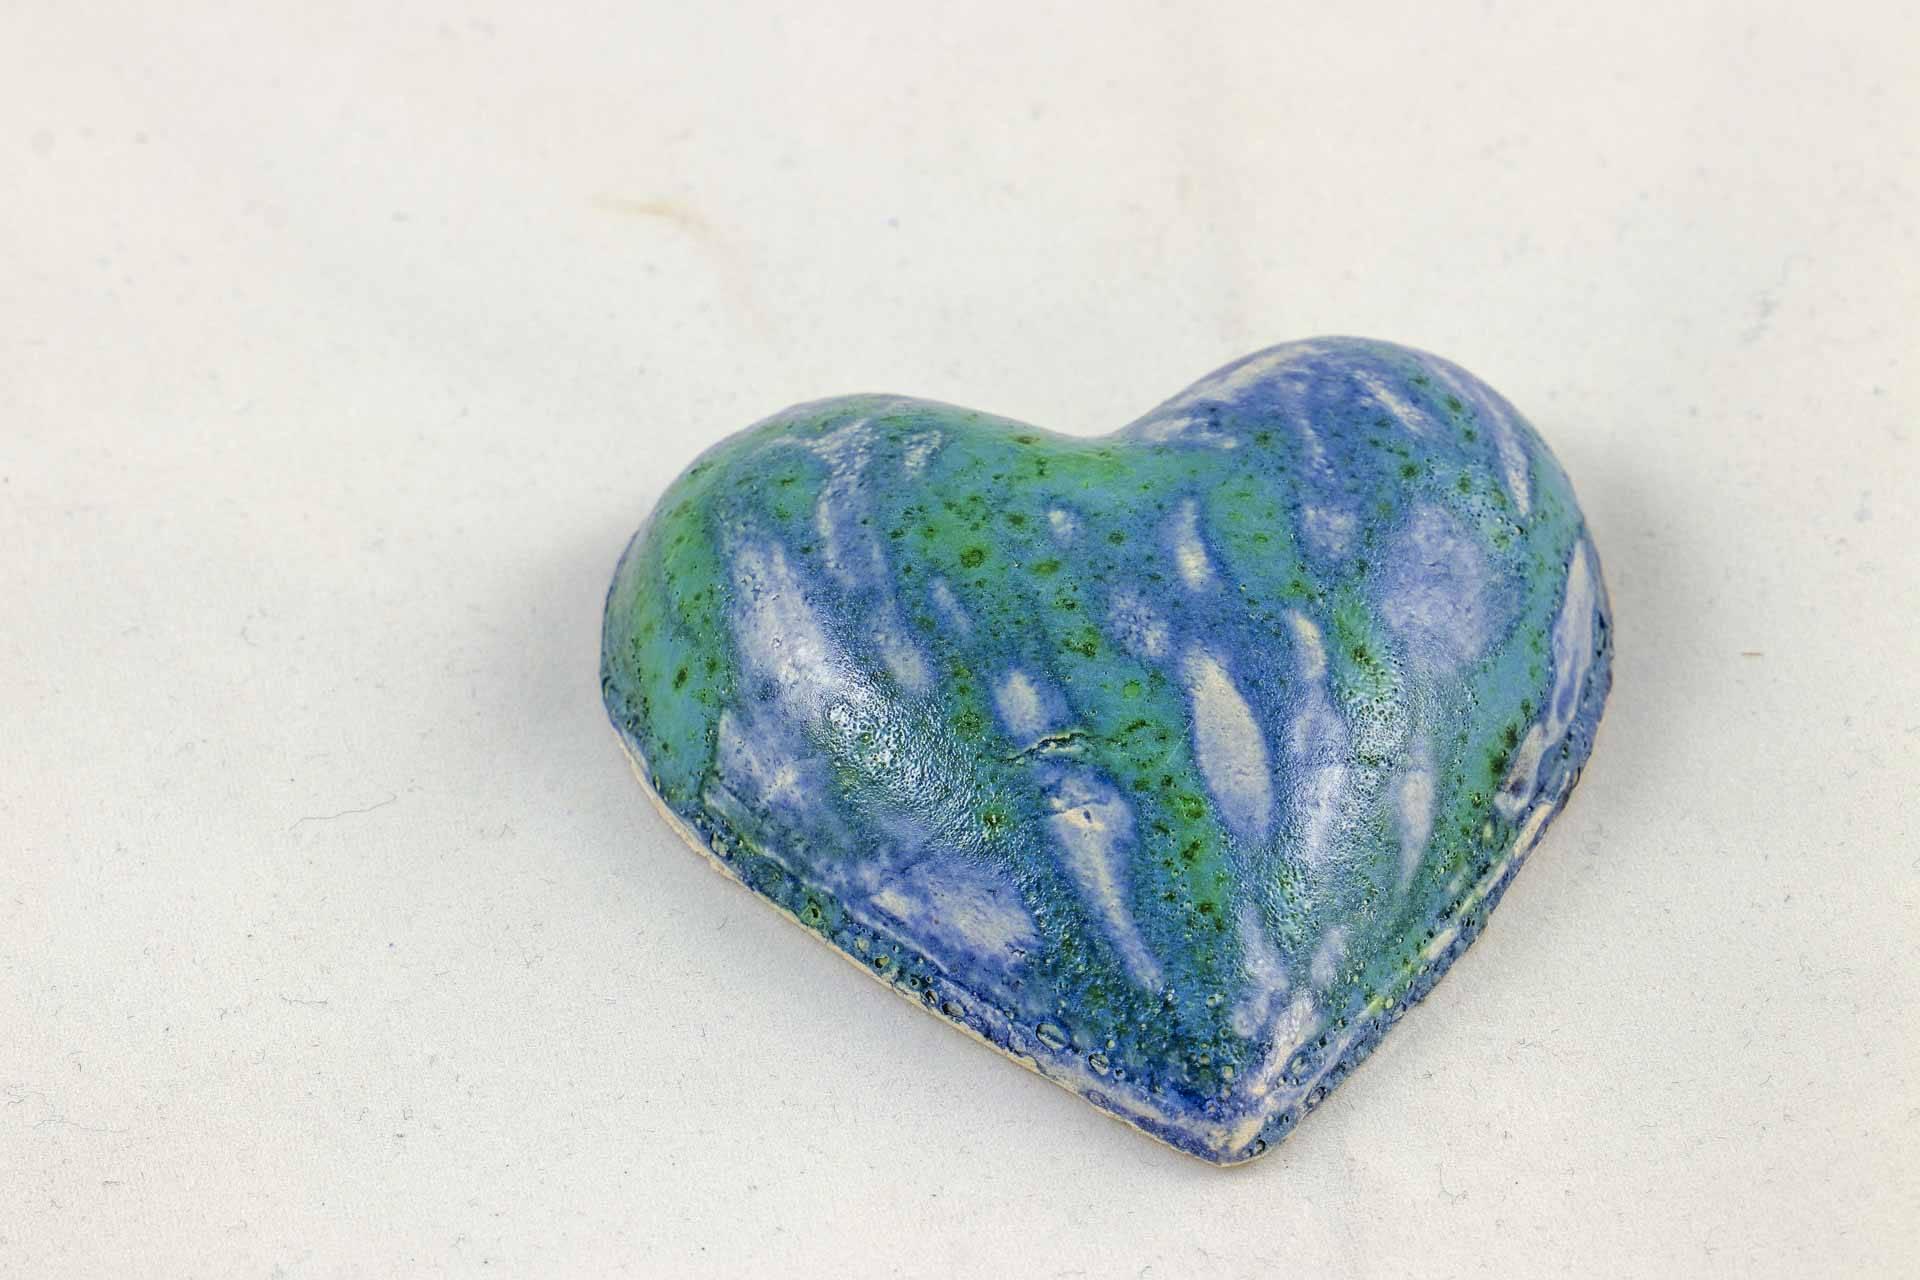 Petra Zobl Keramik - Herz sommerblau melone